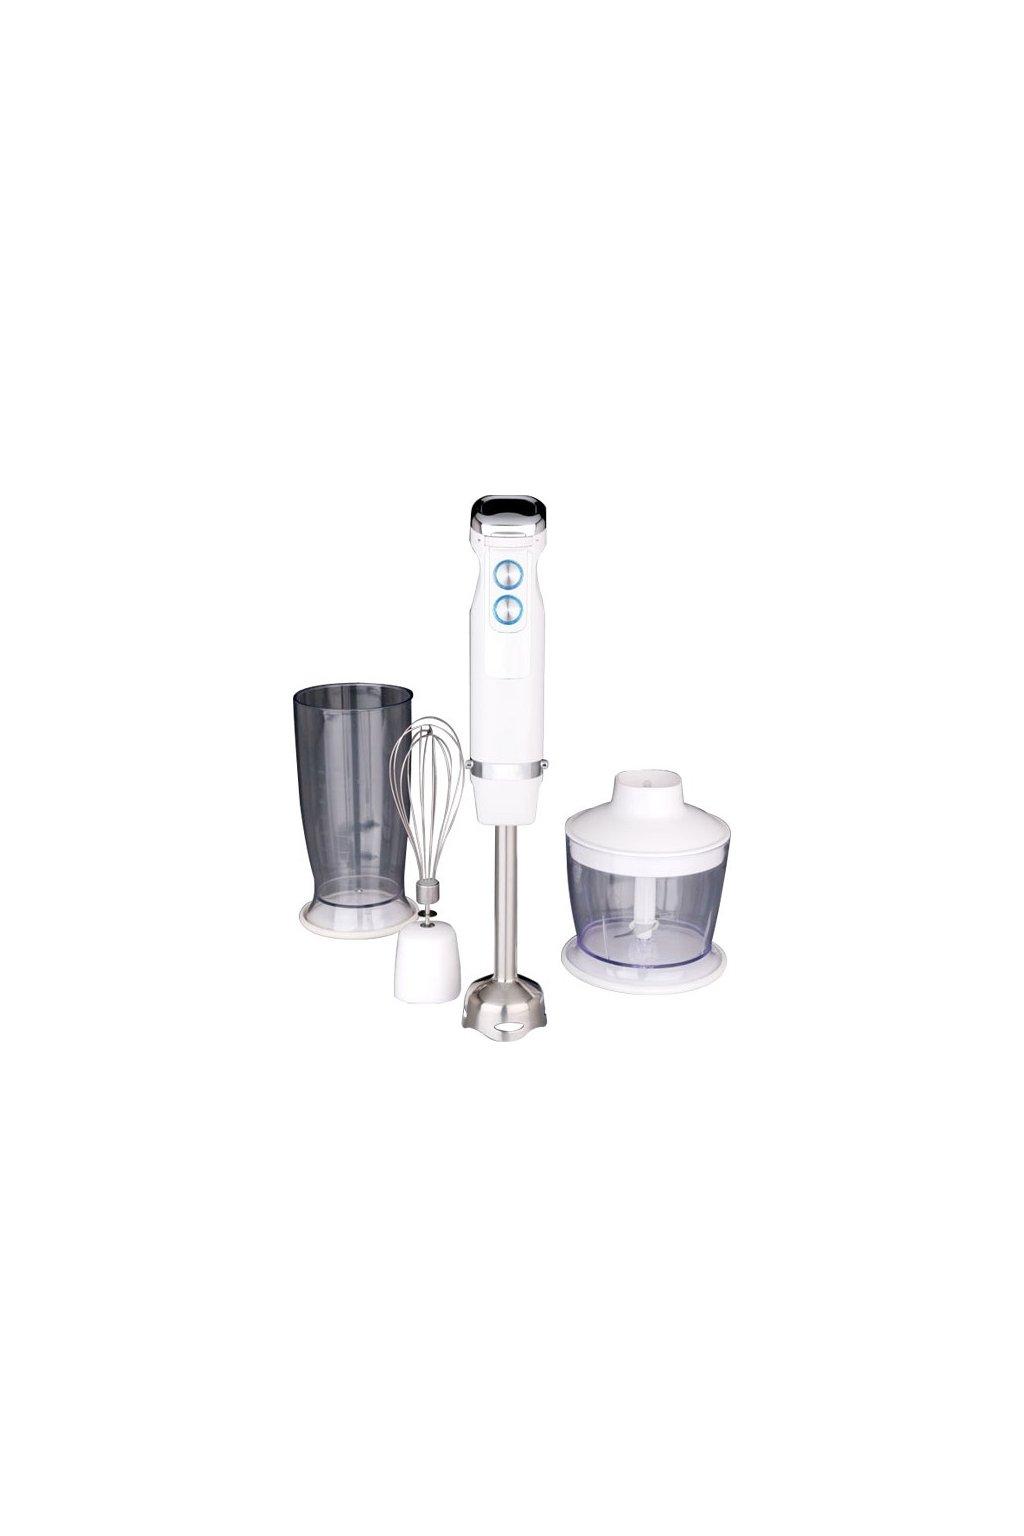 422 tycovy mixer gastroback 40974